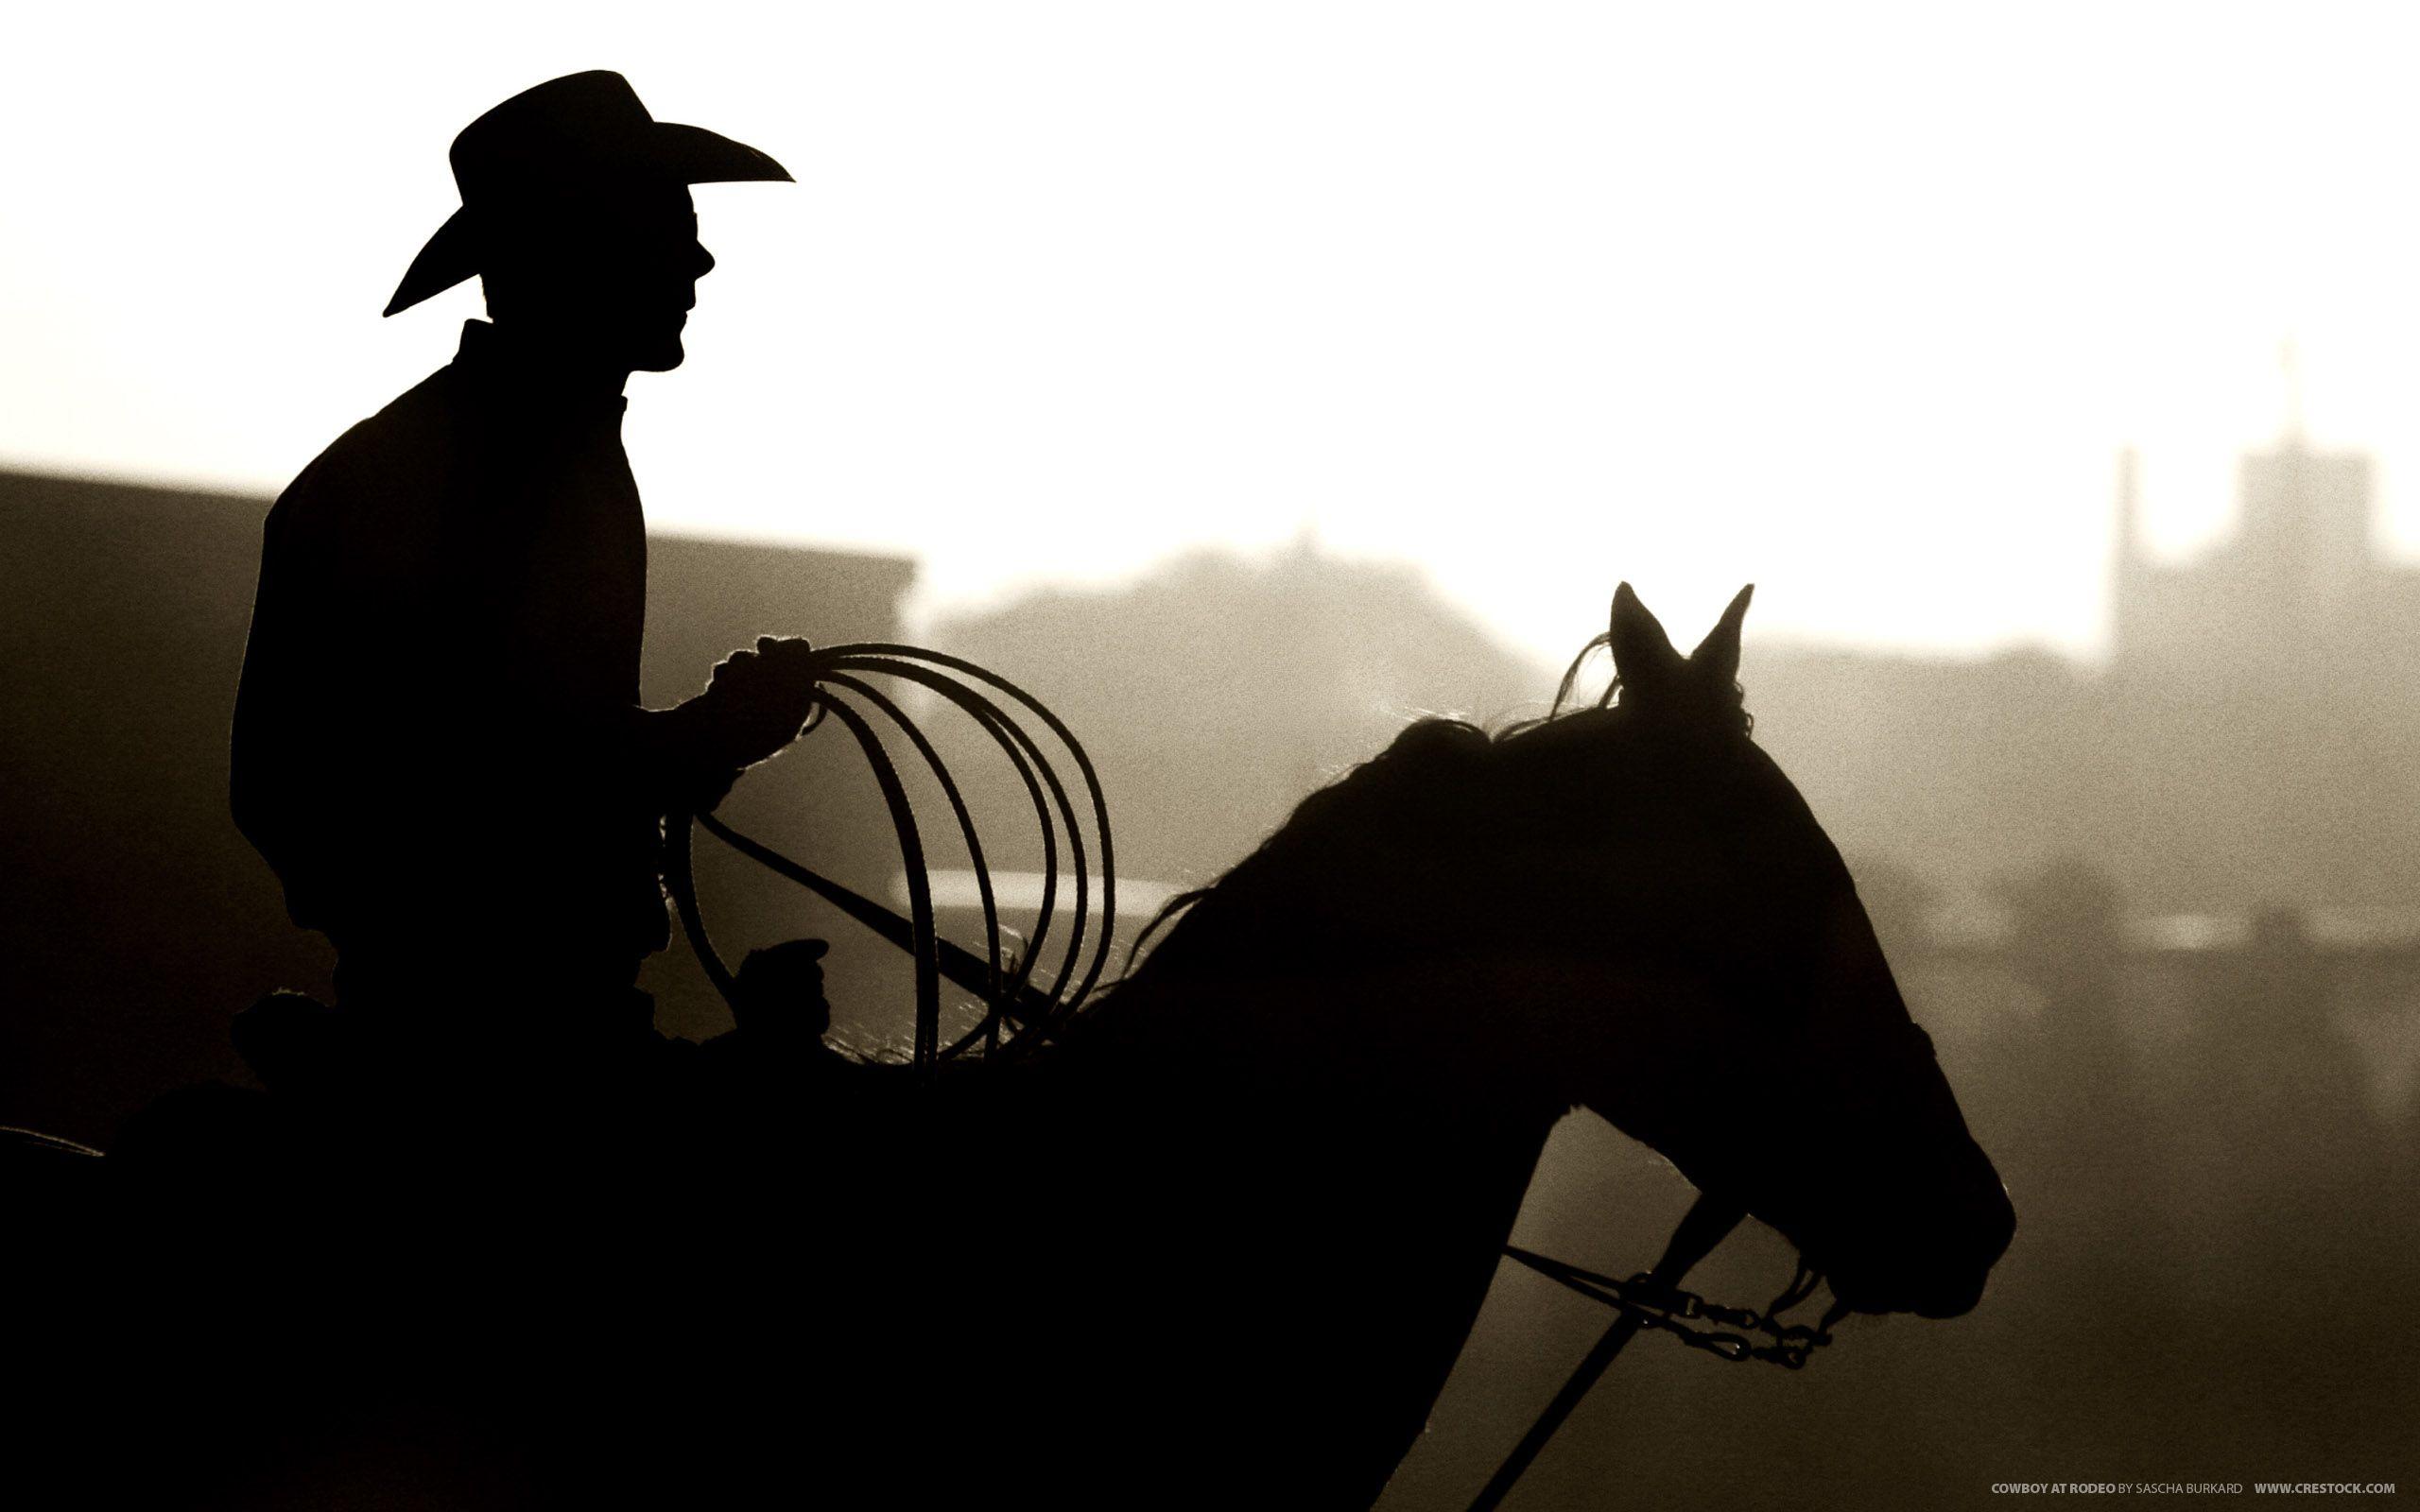 Image Detail For Cowboy At Rodeo Fondos Y Temas Horse Wallpaper Horse Background Horses